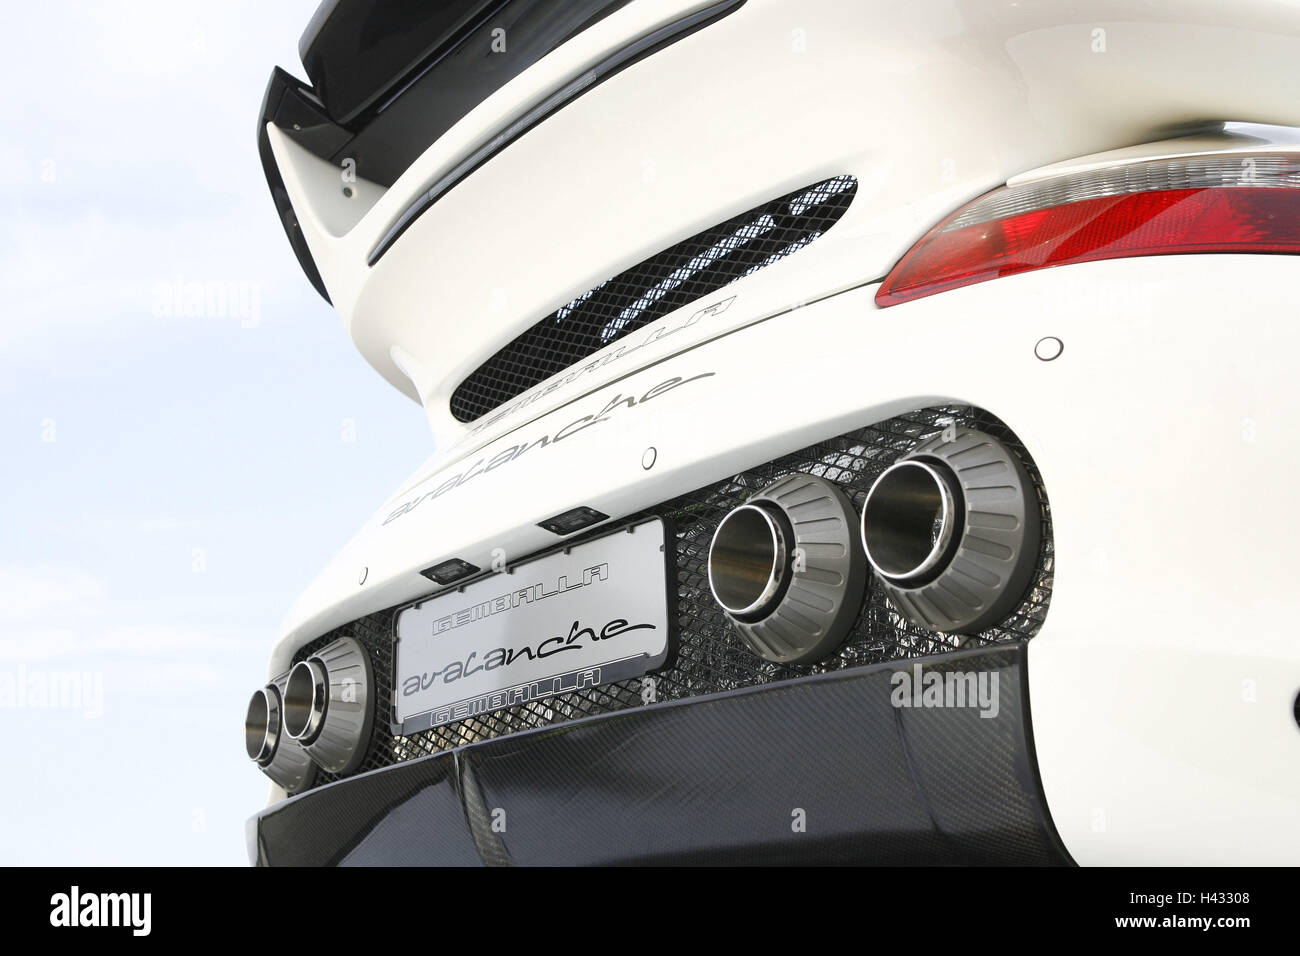 Gemballa Porsche, Avalanche, white, rear from below, detail - Stock Image